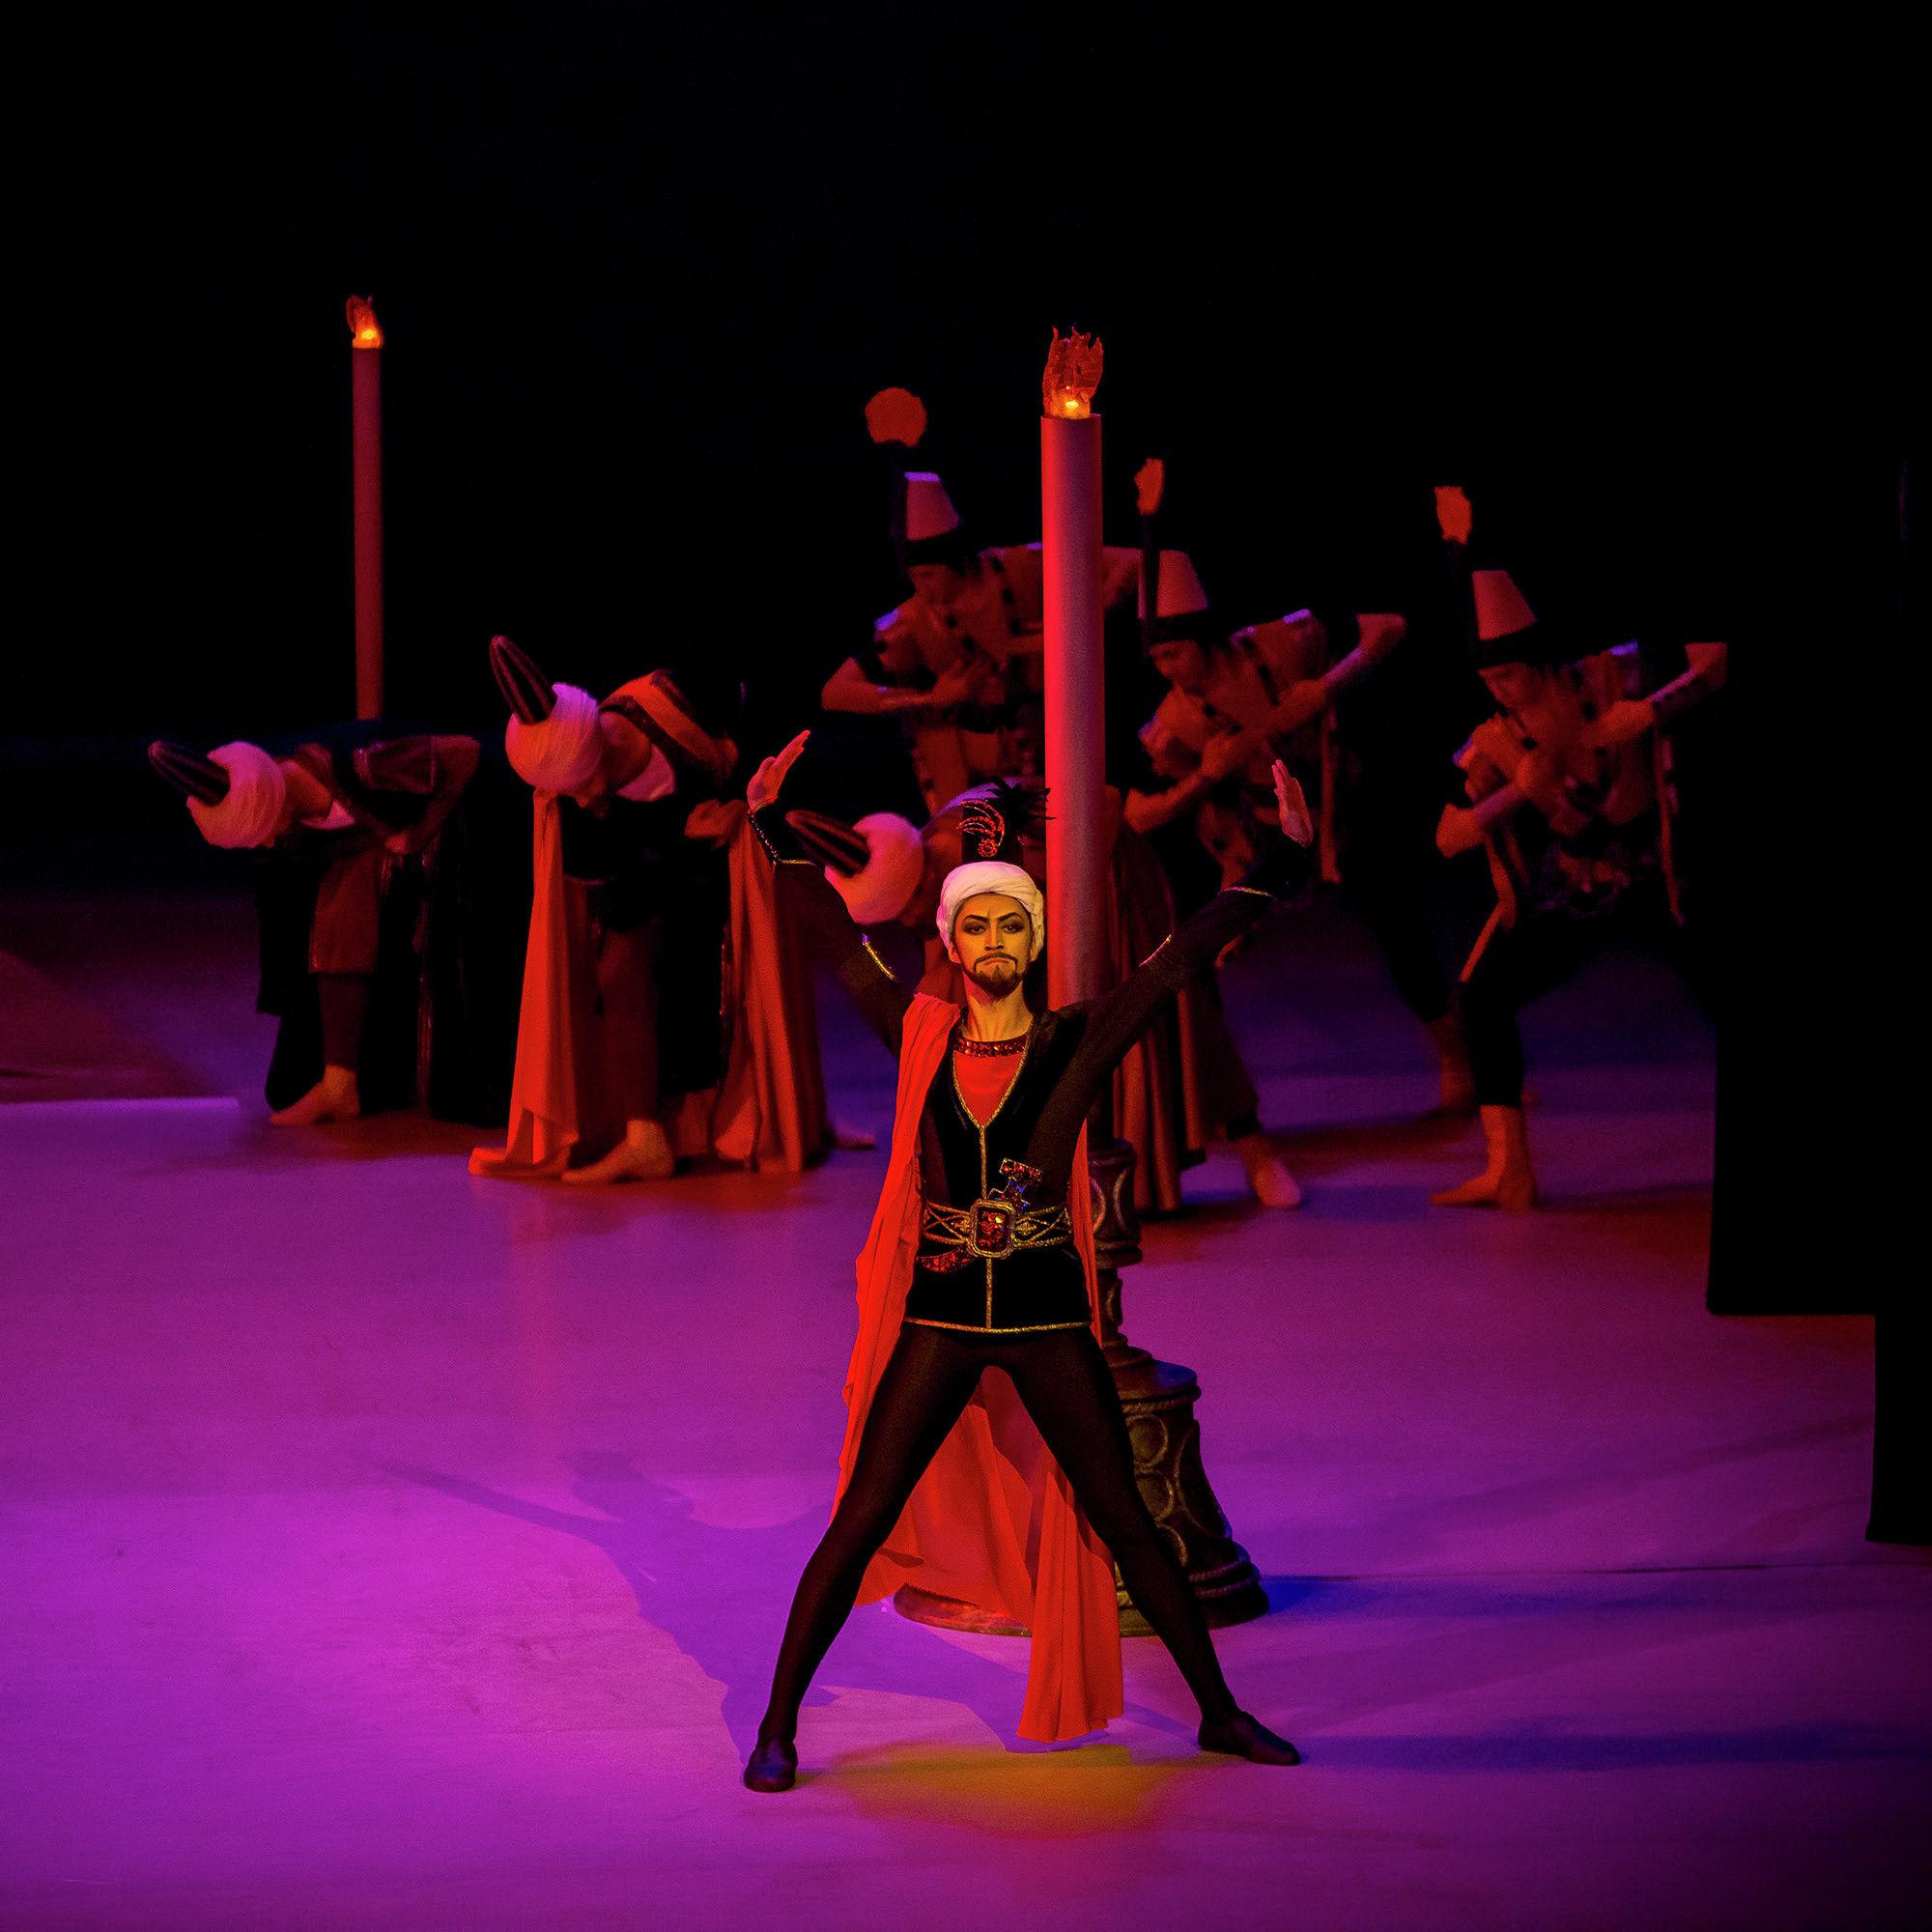 Амир Жексенбек, воплотивший образ Визиря, на сцене театра Астана Балет